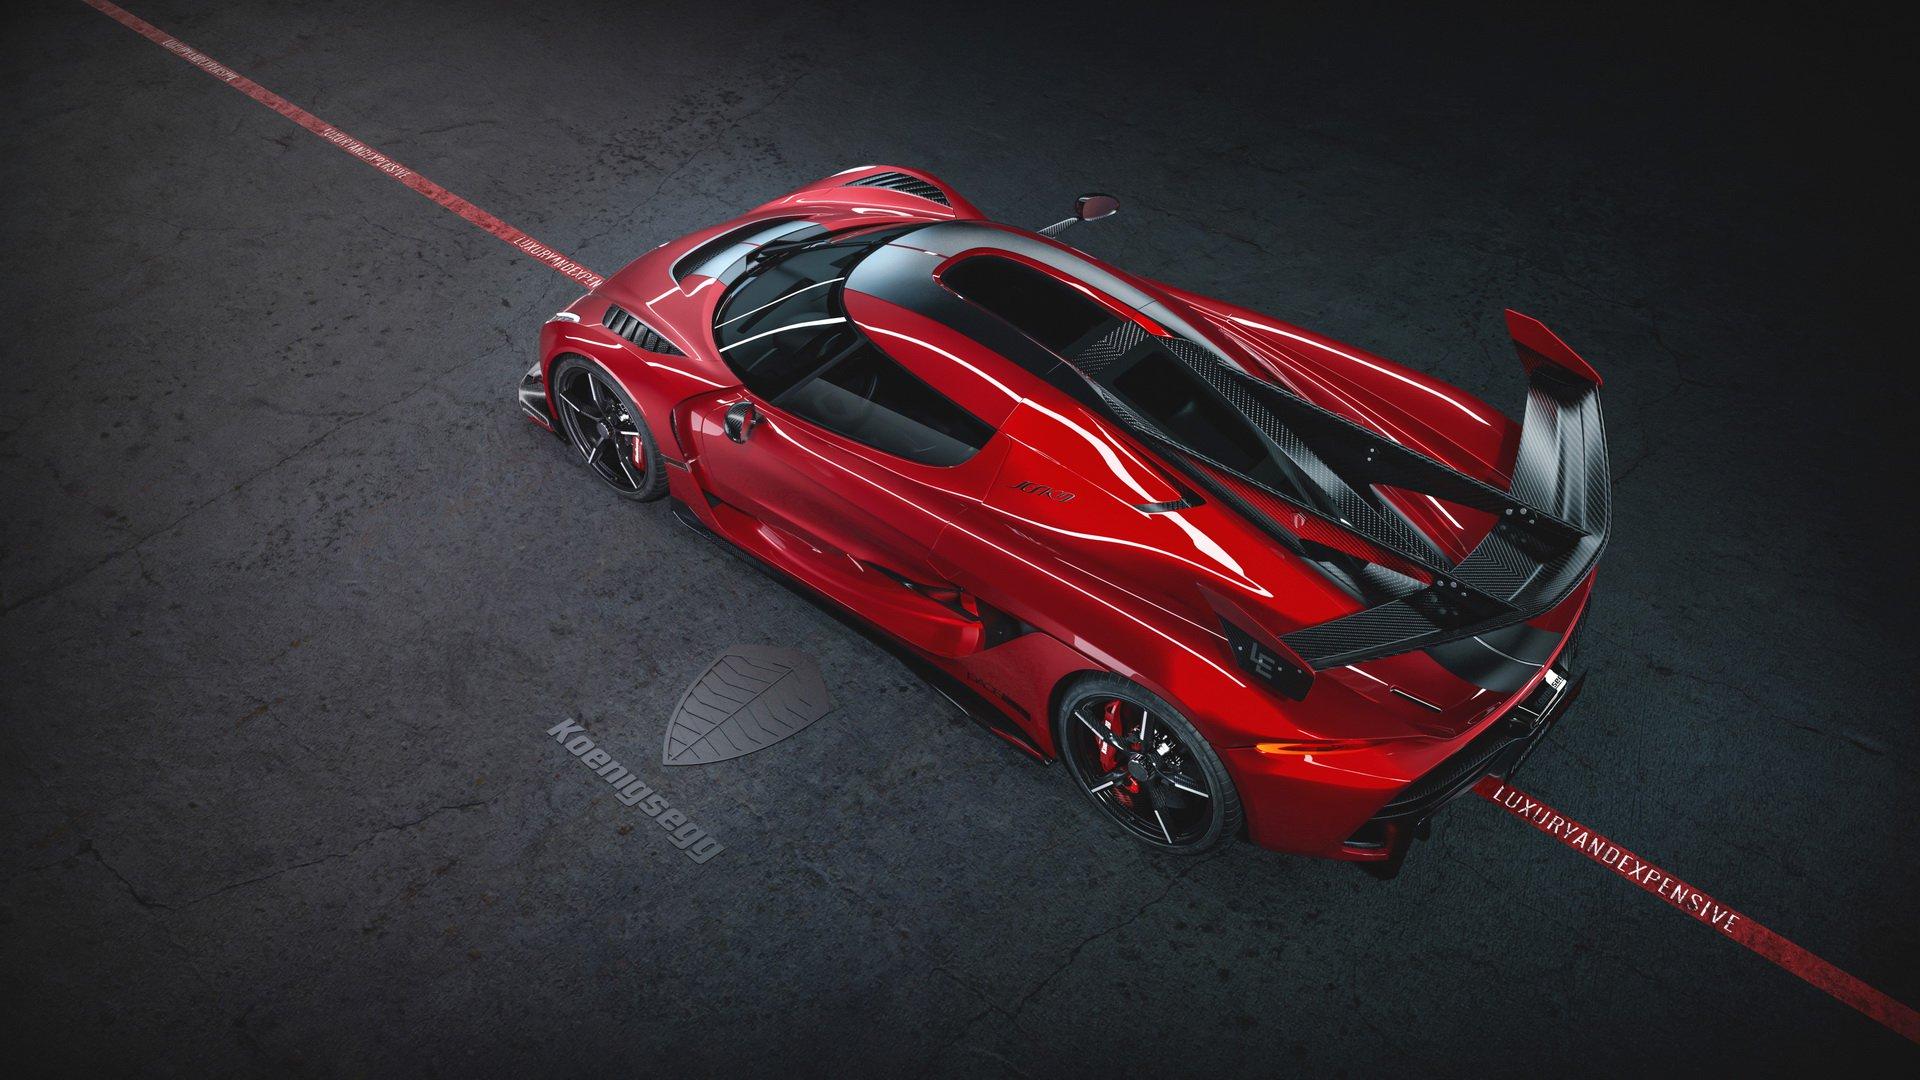 Koenigsegg-Jesko-Cherry-Red-Edition-10-8